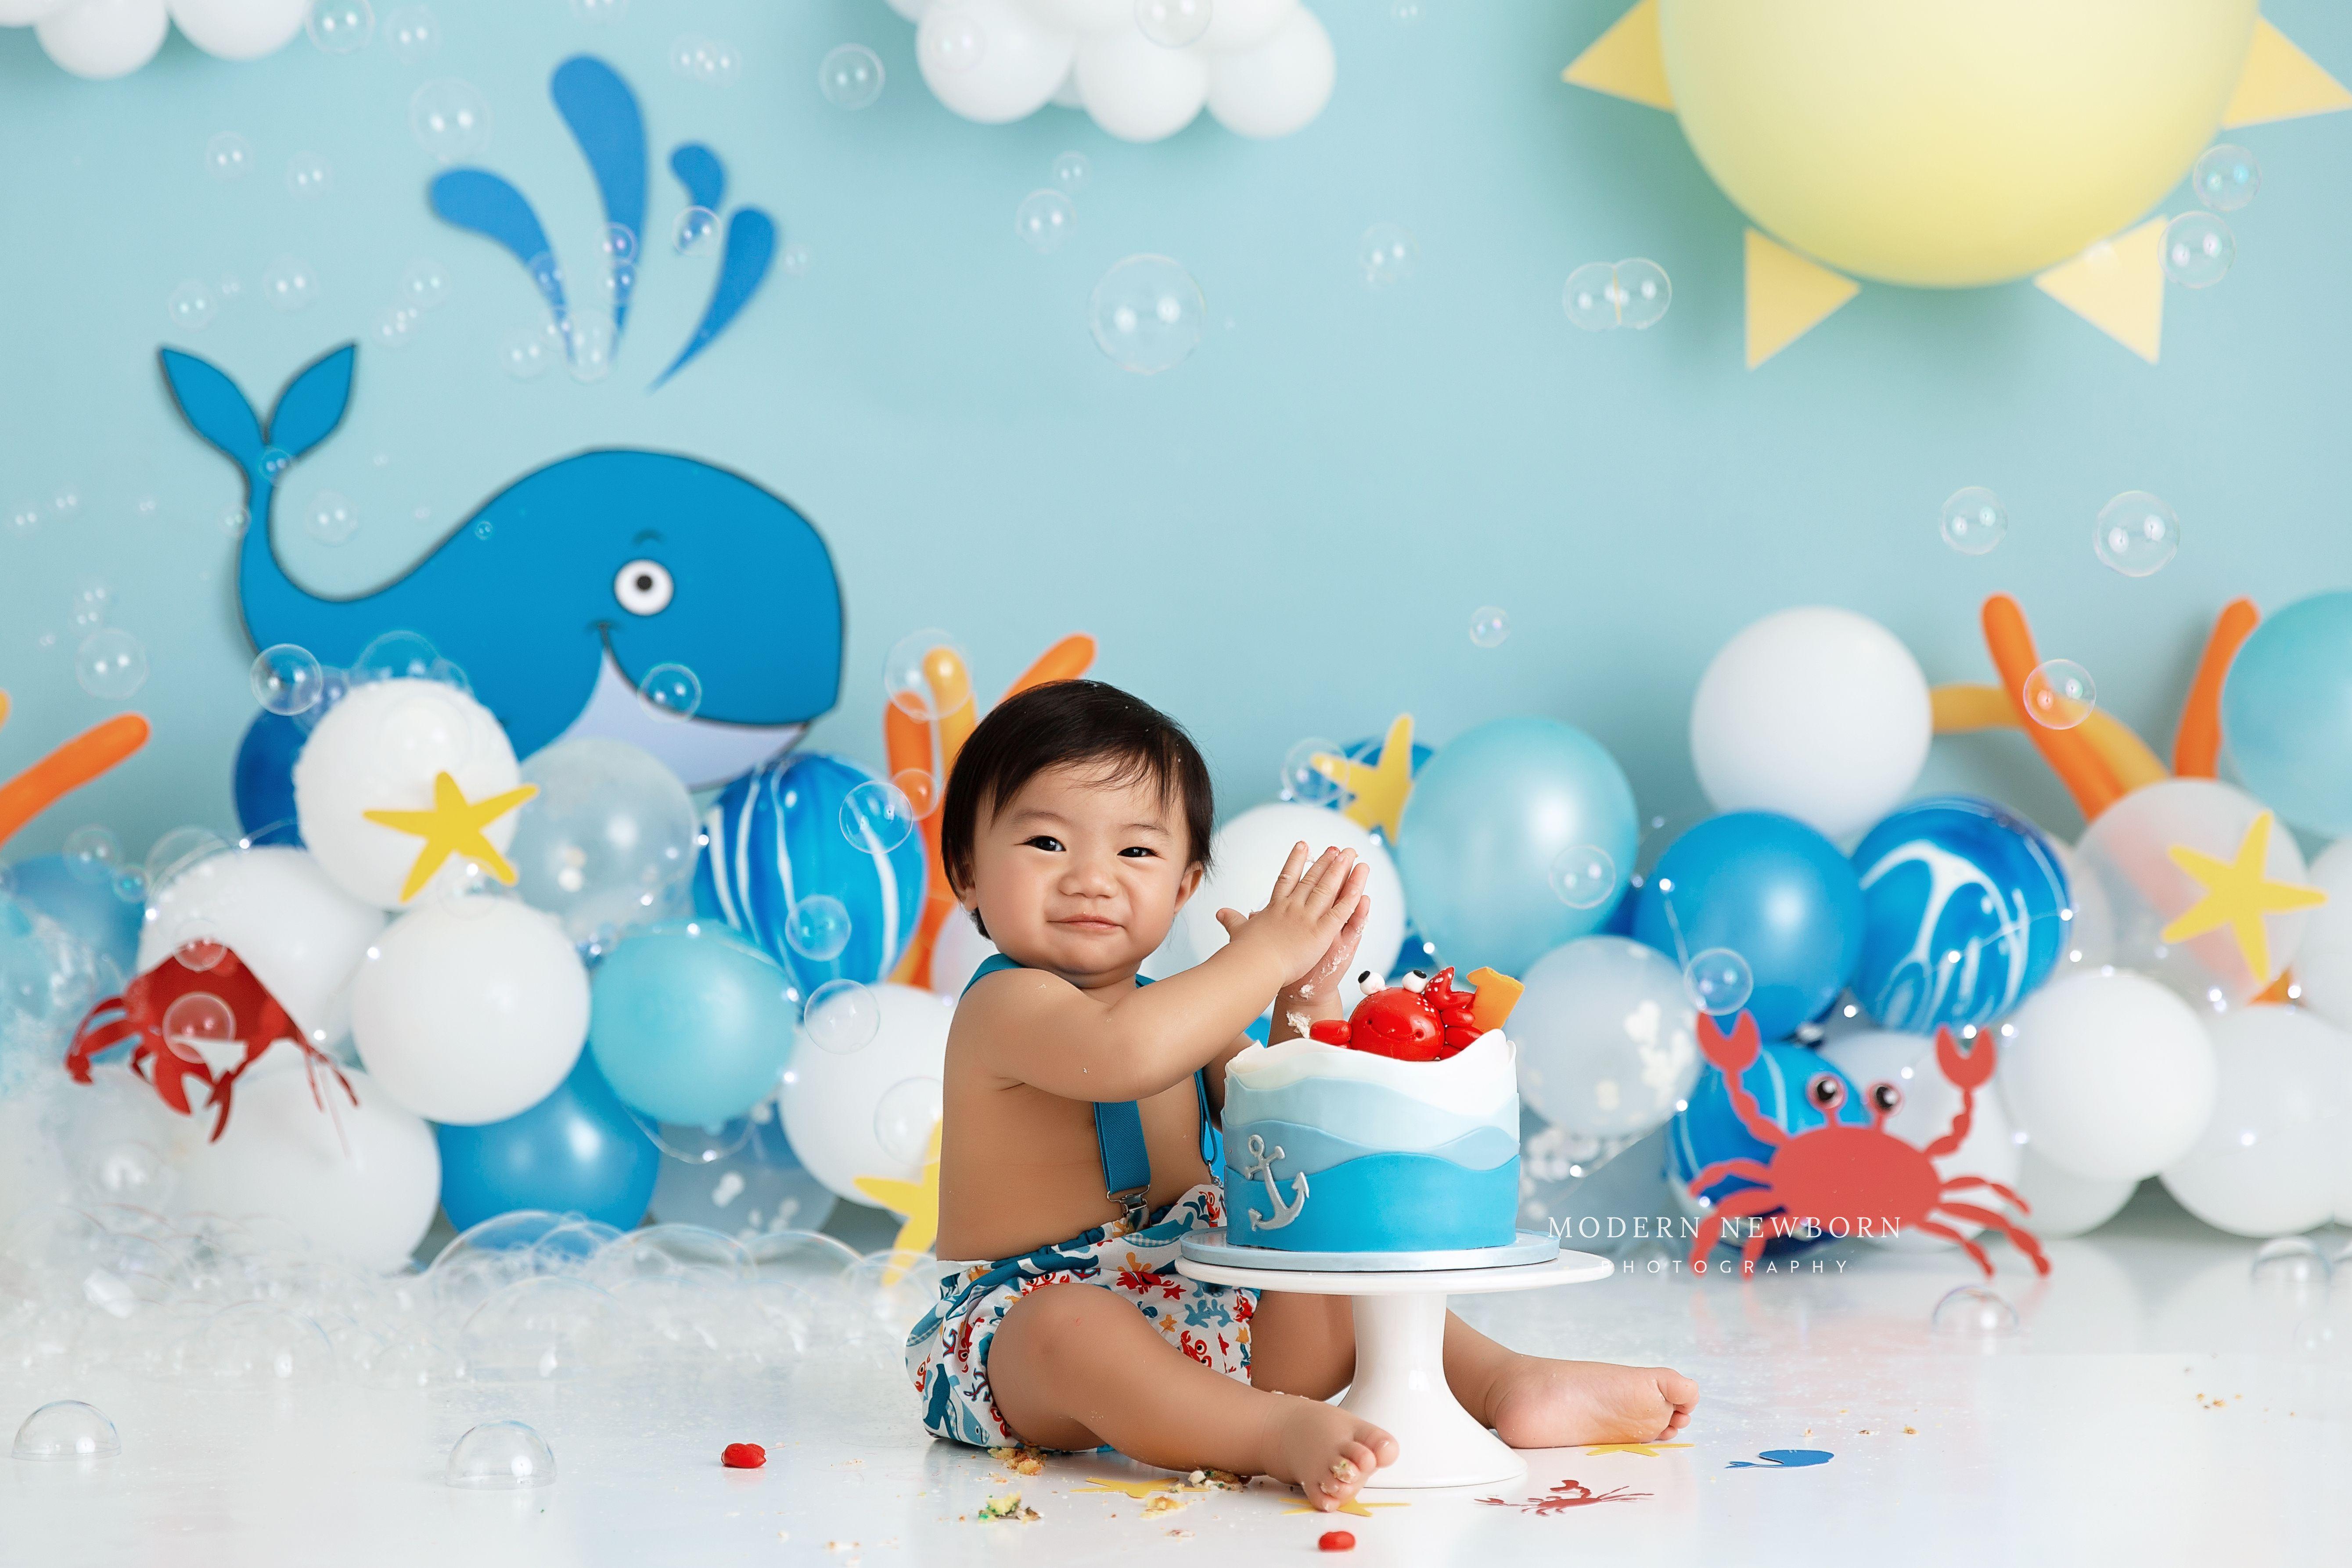 Balloon garland cake smash smash cake boy cake smash